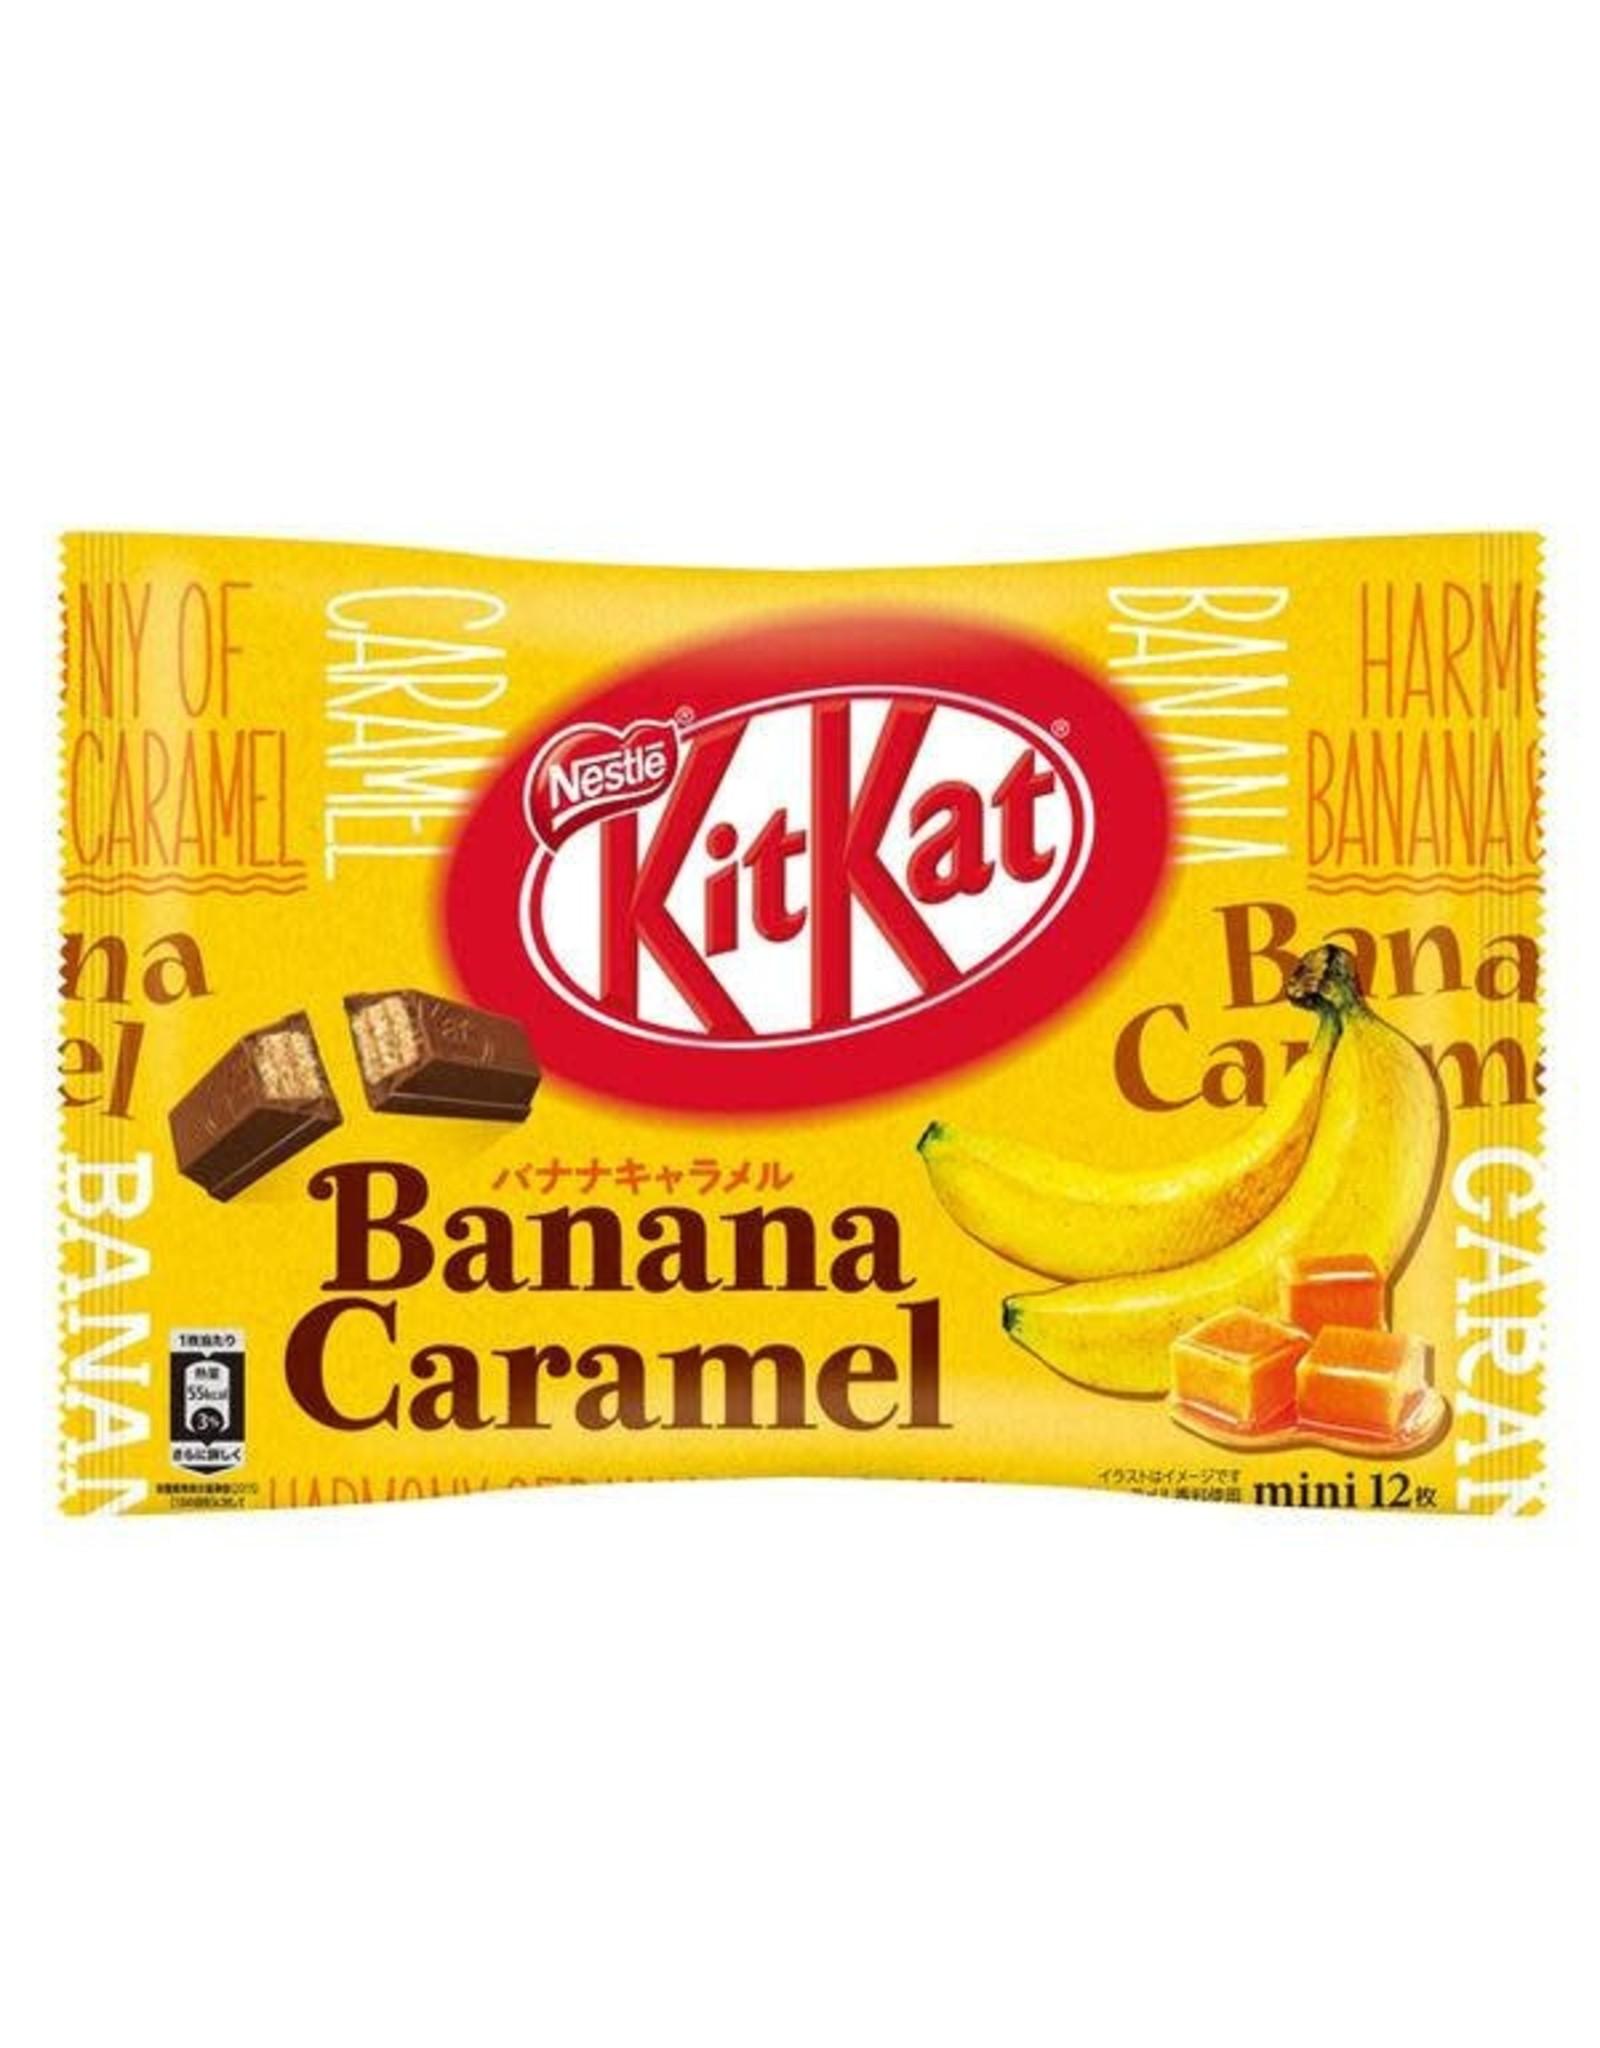 KitKat Mini Banana Caramel